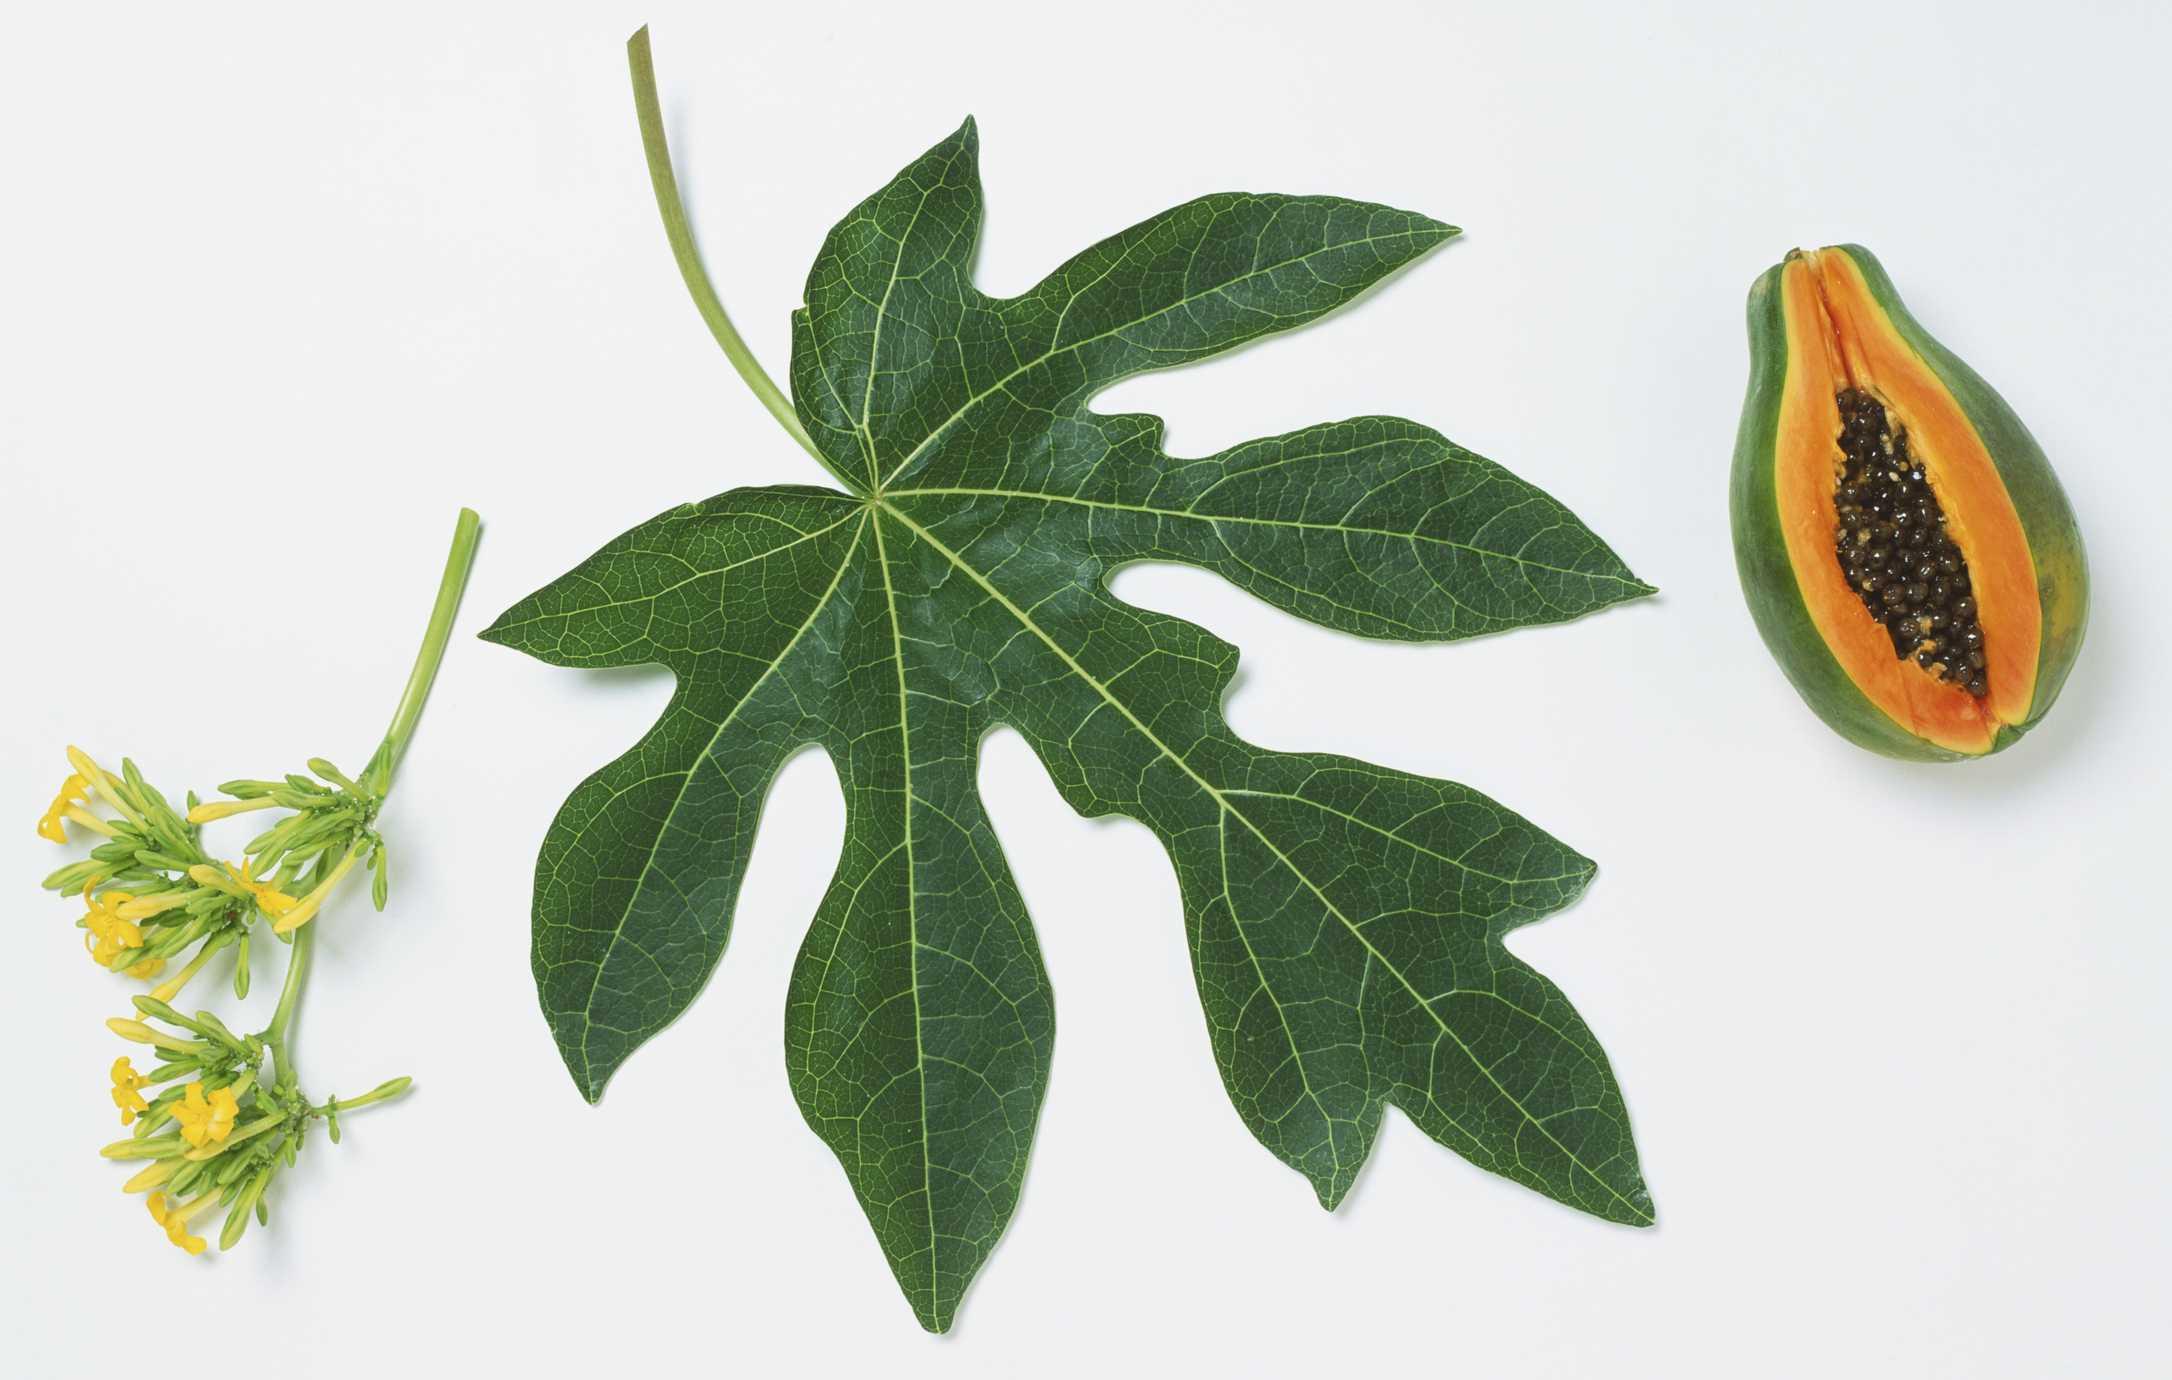 Lobed leaf